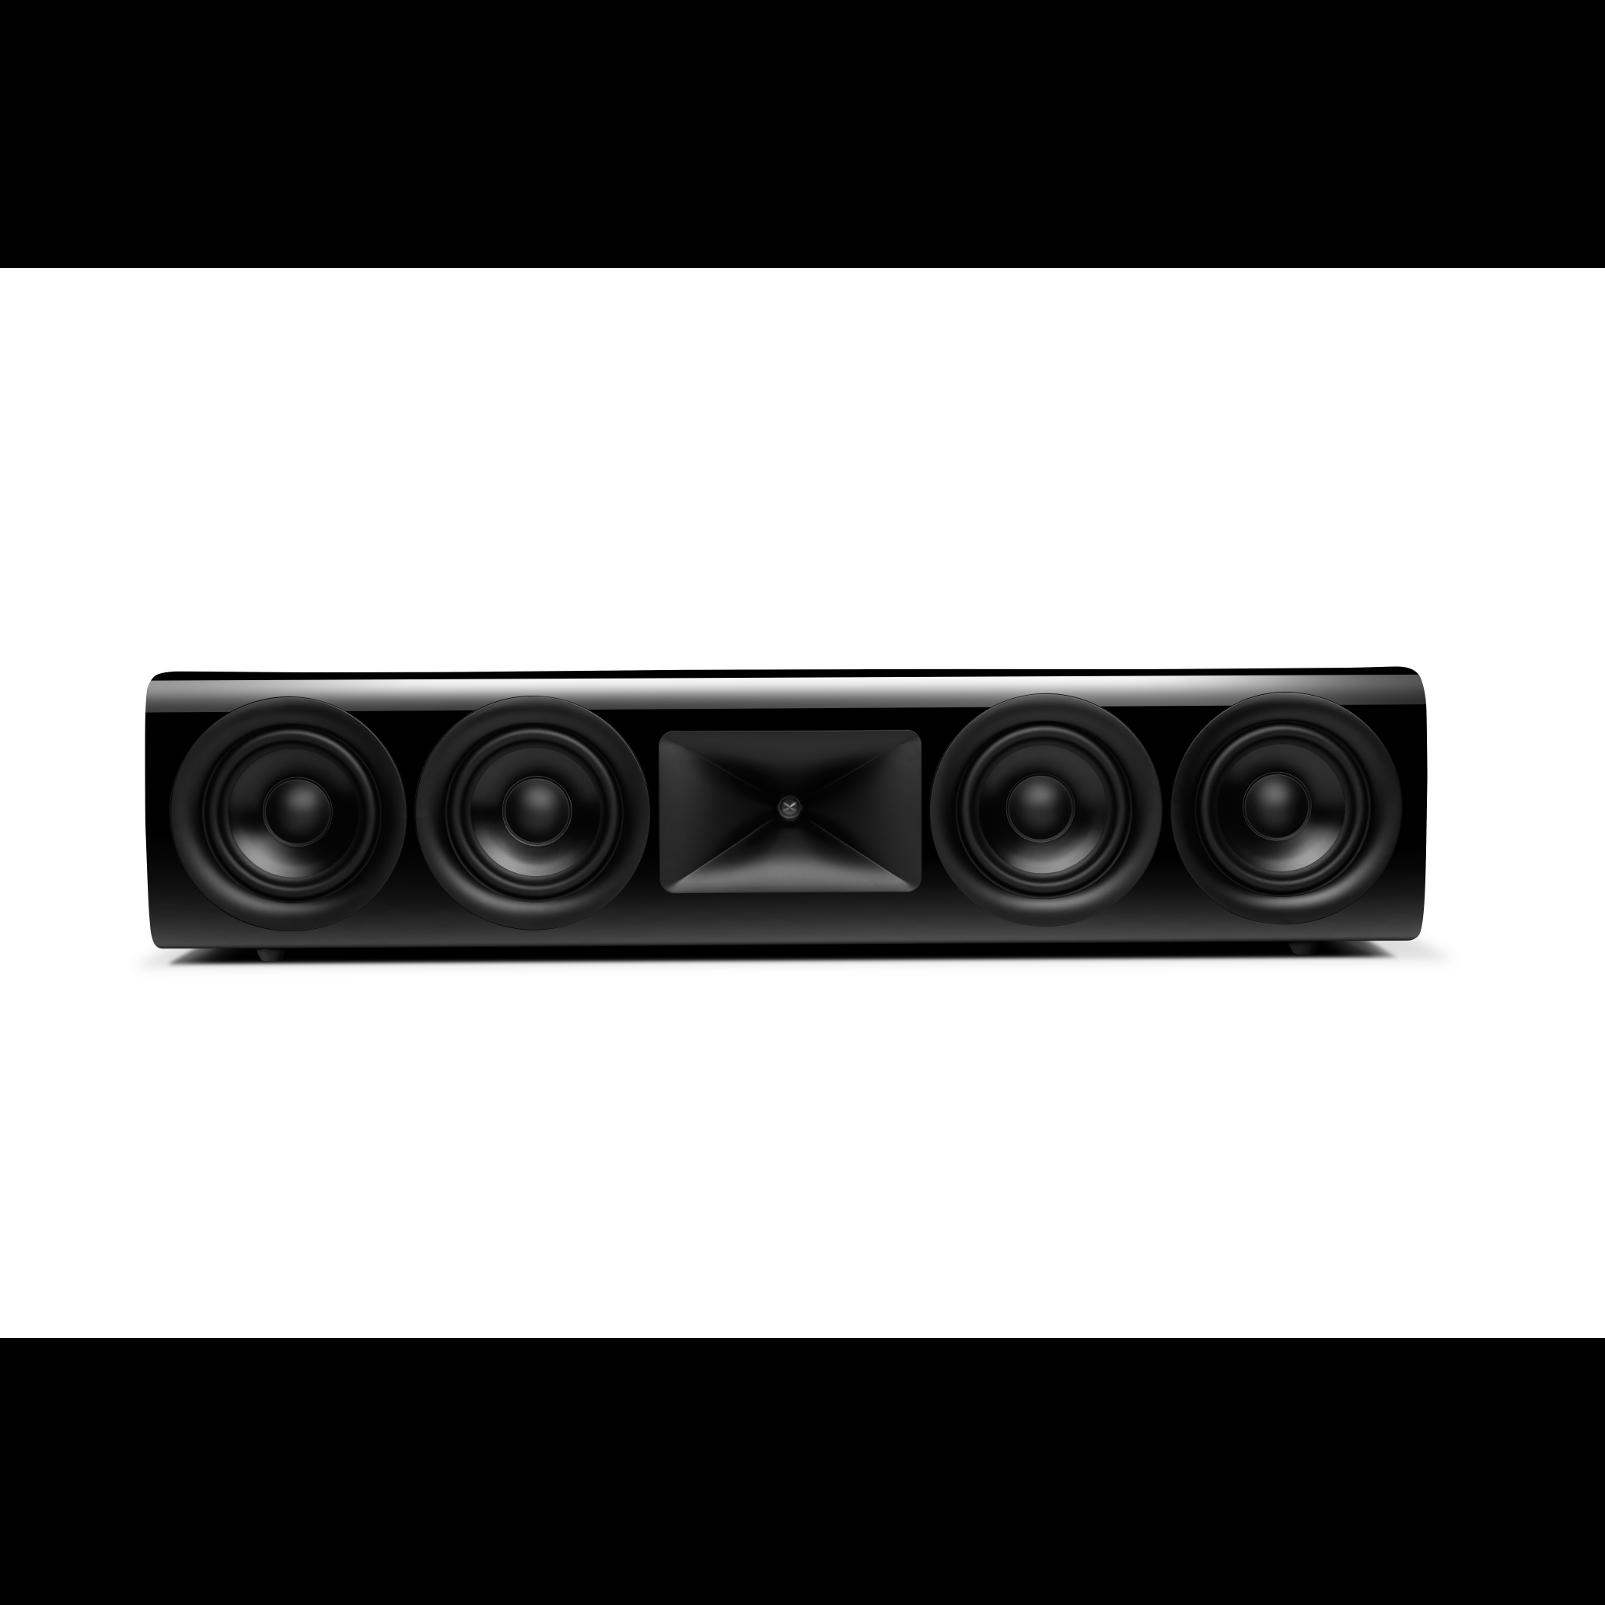 HDI-4500 - Black Gloss - 2 ½-way Quadruple 5.25-inch (130mm) Center Channel Loudspeaker - Hero